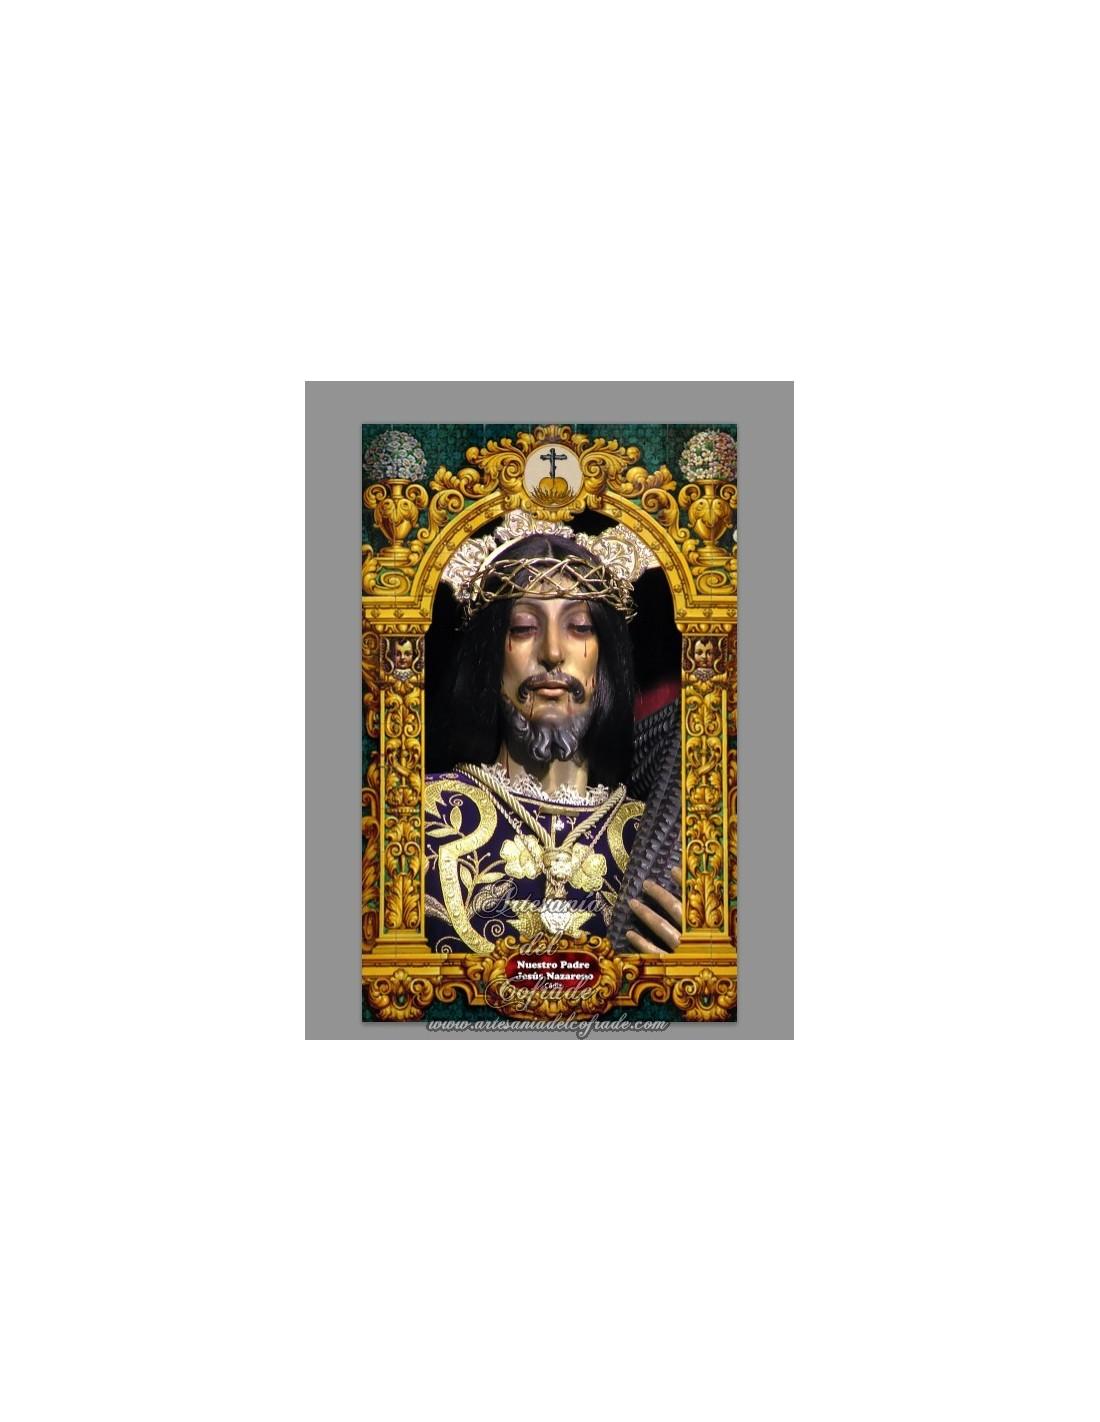 En venta bonito azulejo de ntro padre jes s nazareno de c diz for Azulejos cadiz